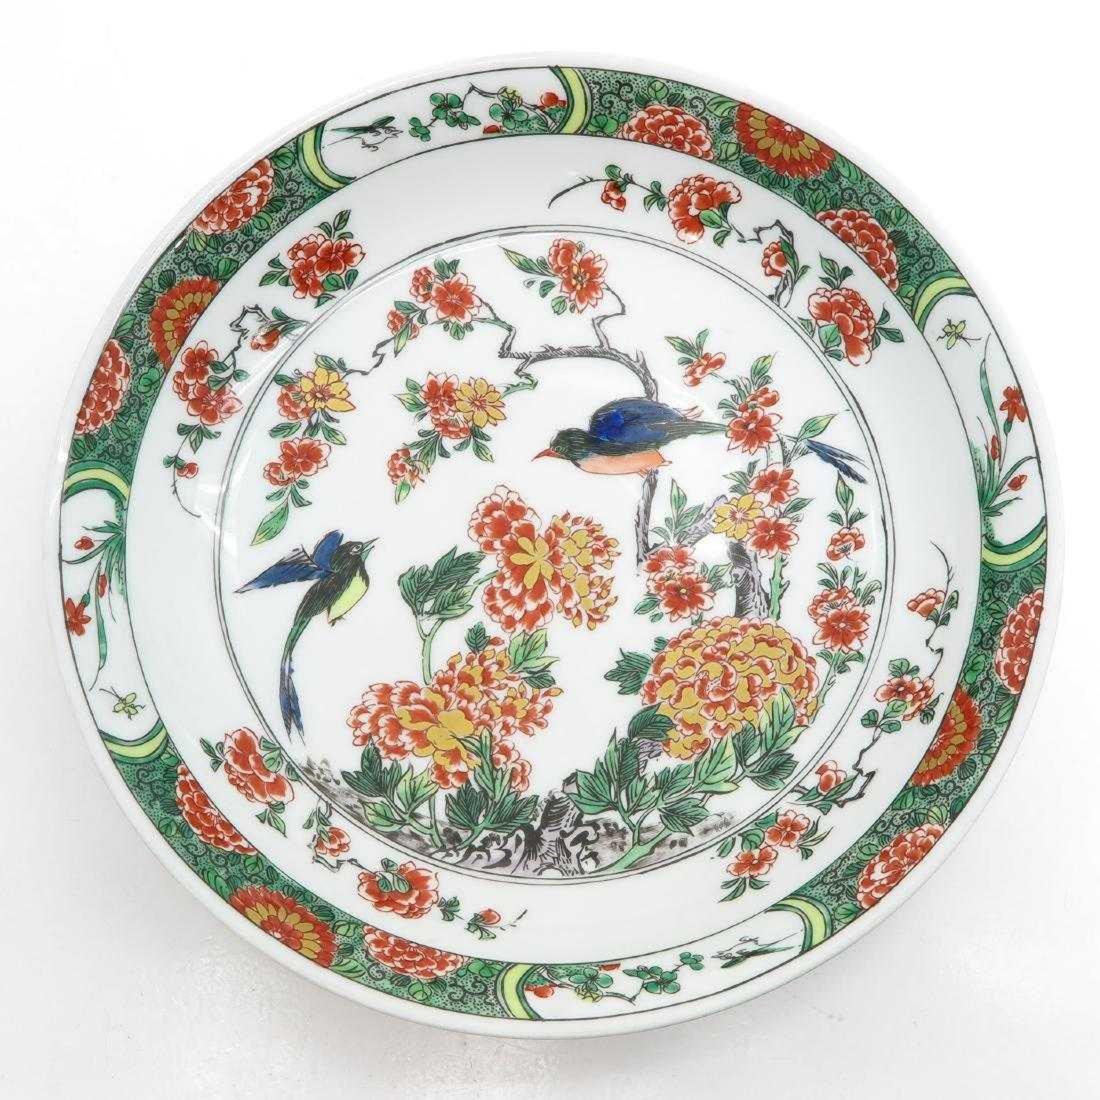 Polychrome Decor Porcelain Plate